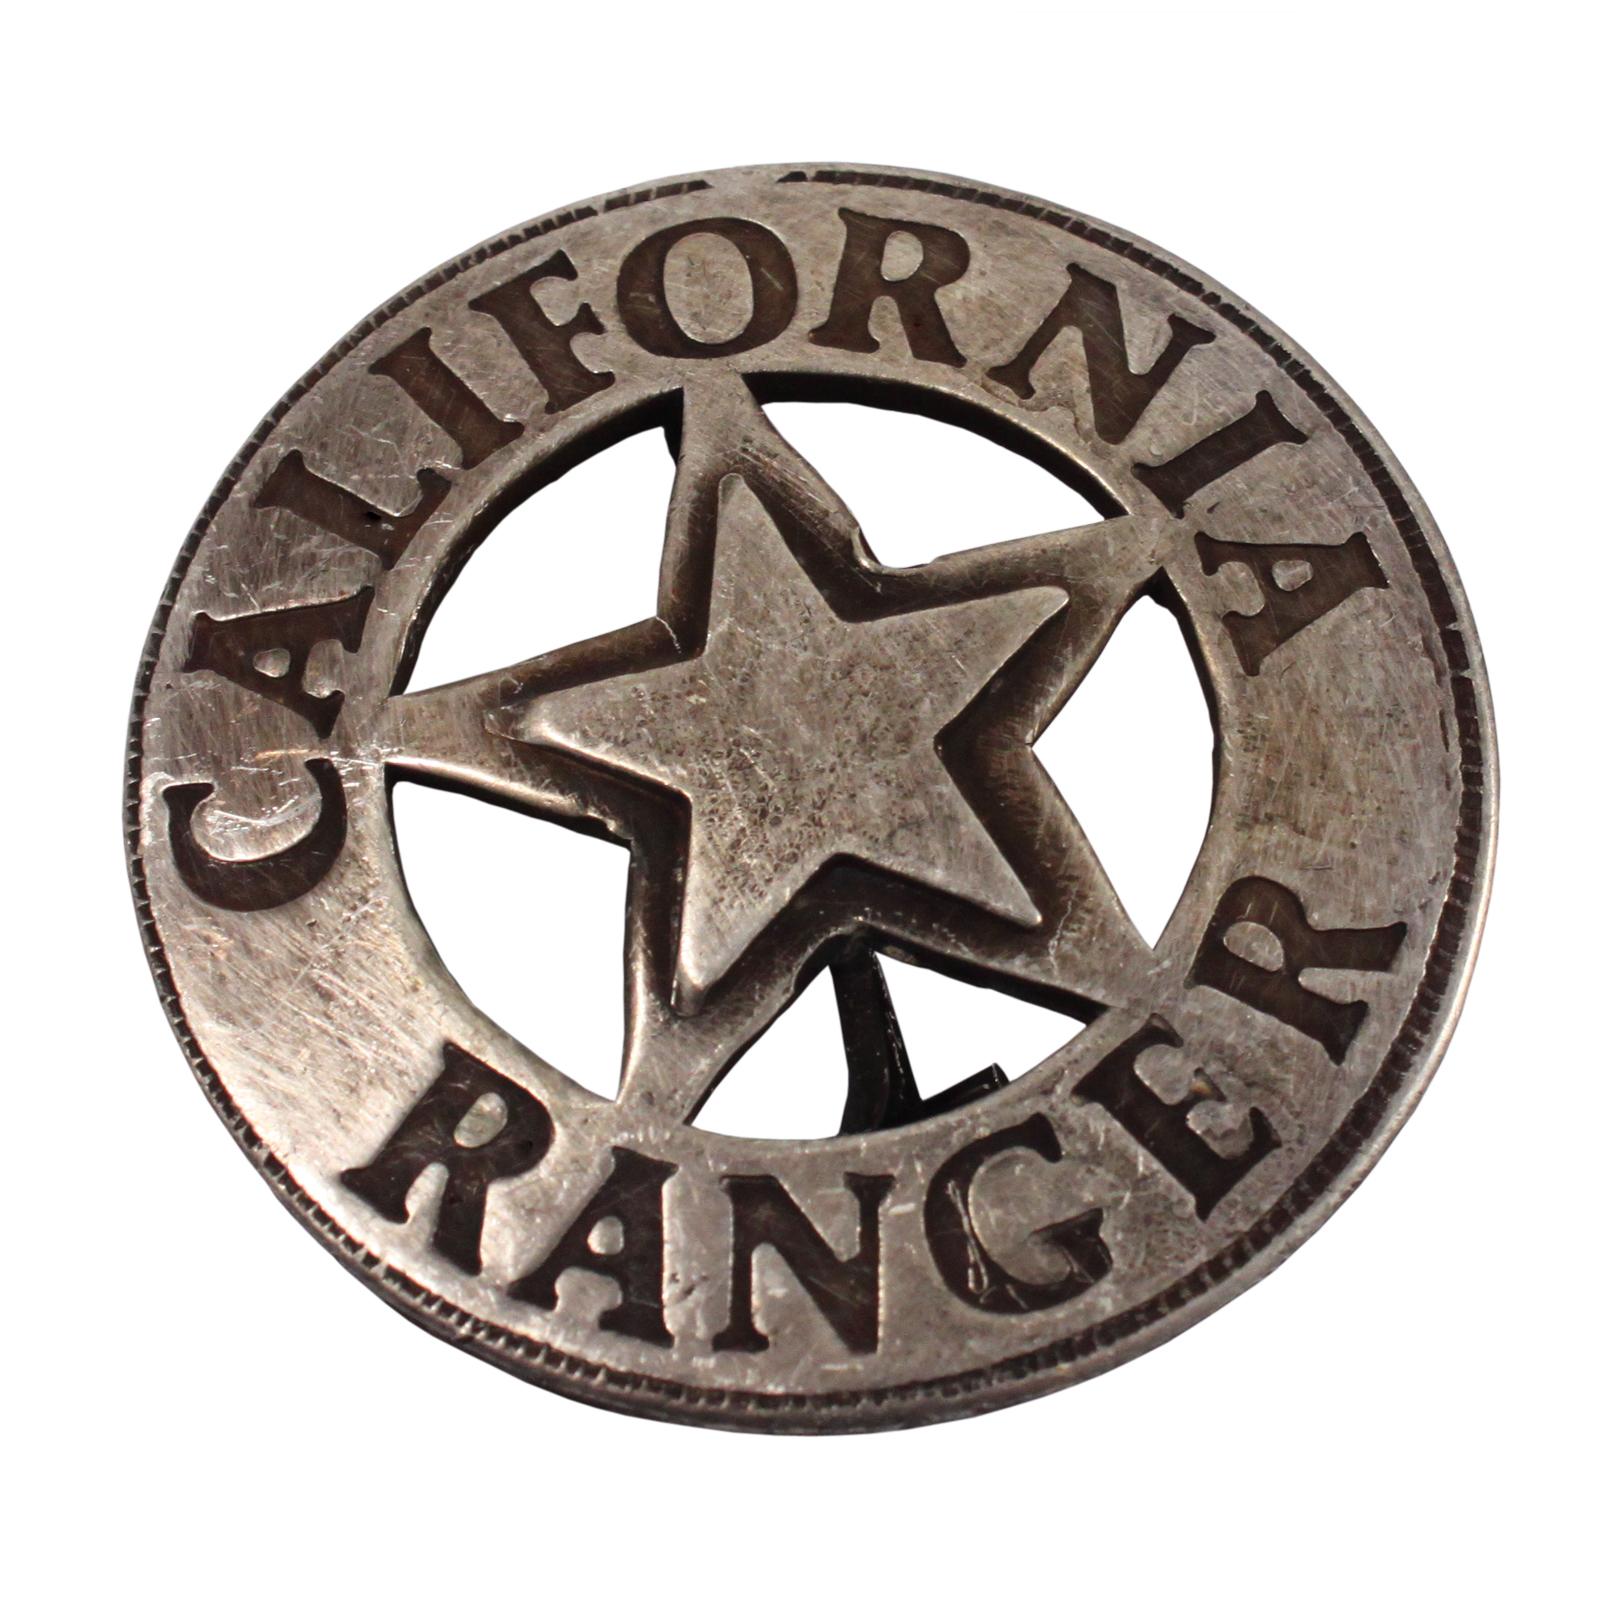 California Ranger Old West Badge